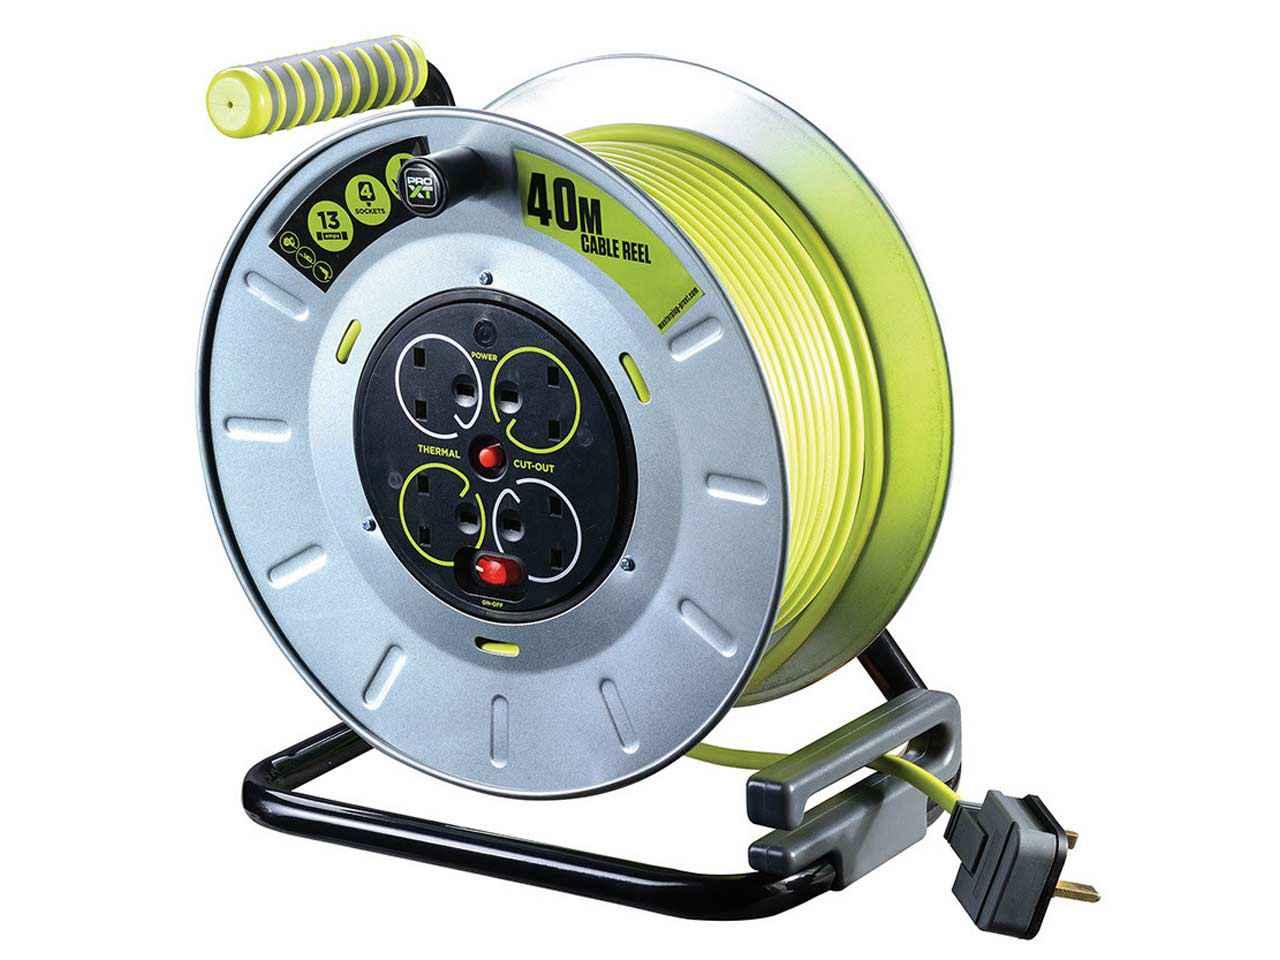 Festool 203924 H05 RN-F 2x1 240 V plug it Cable 4 mètres